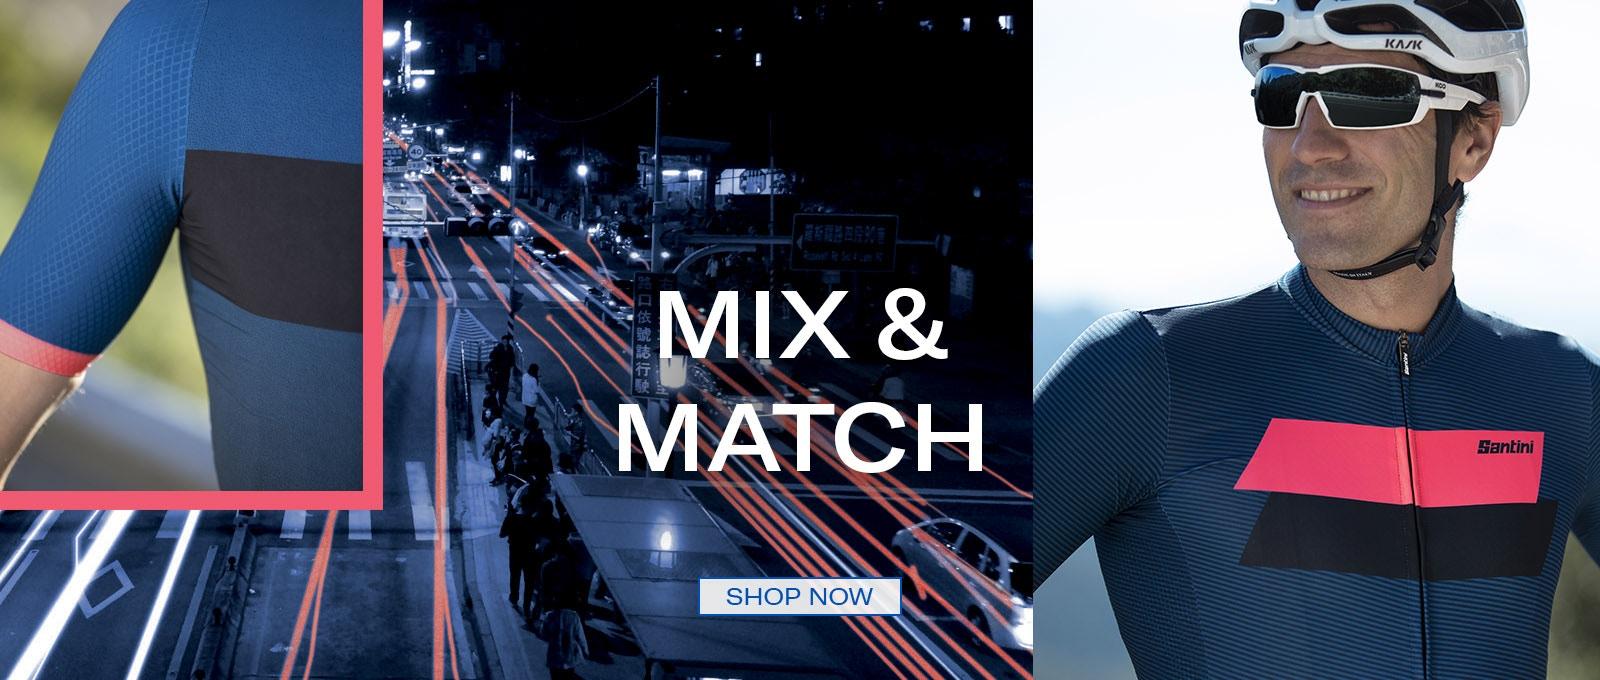 Mitch & Match